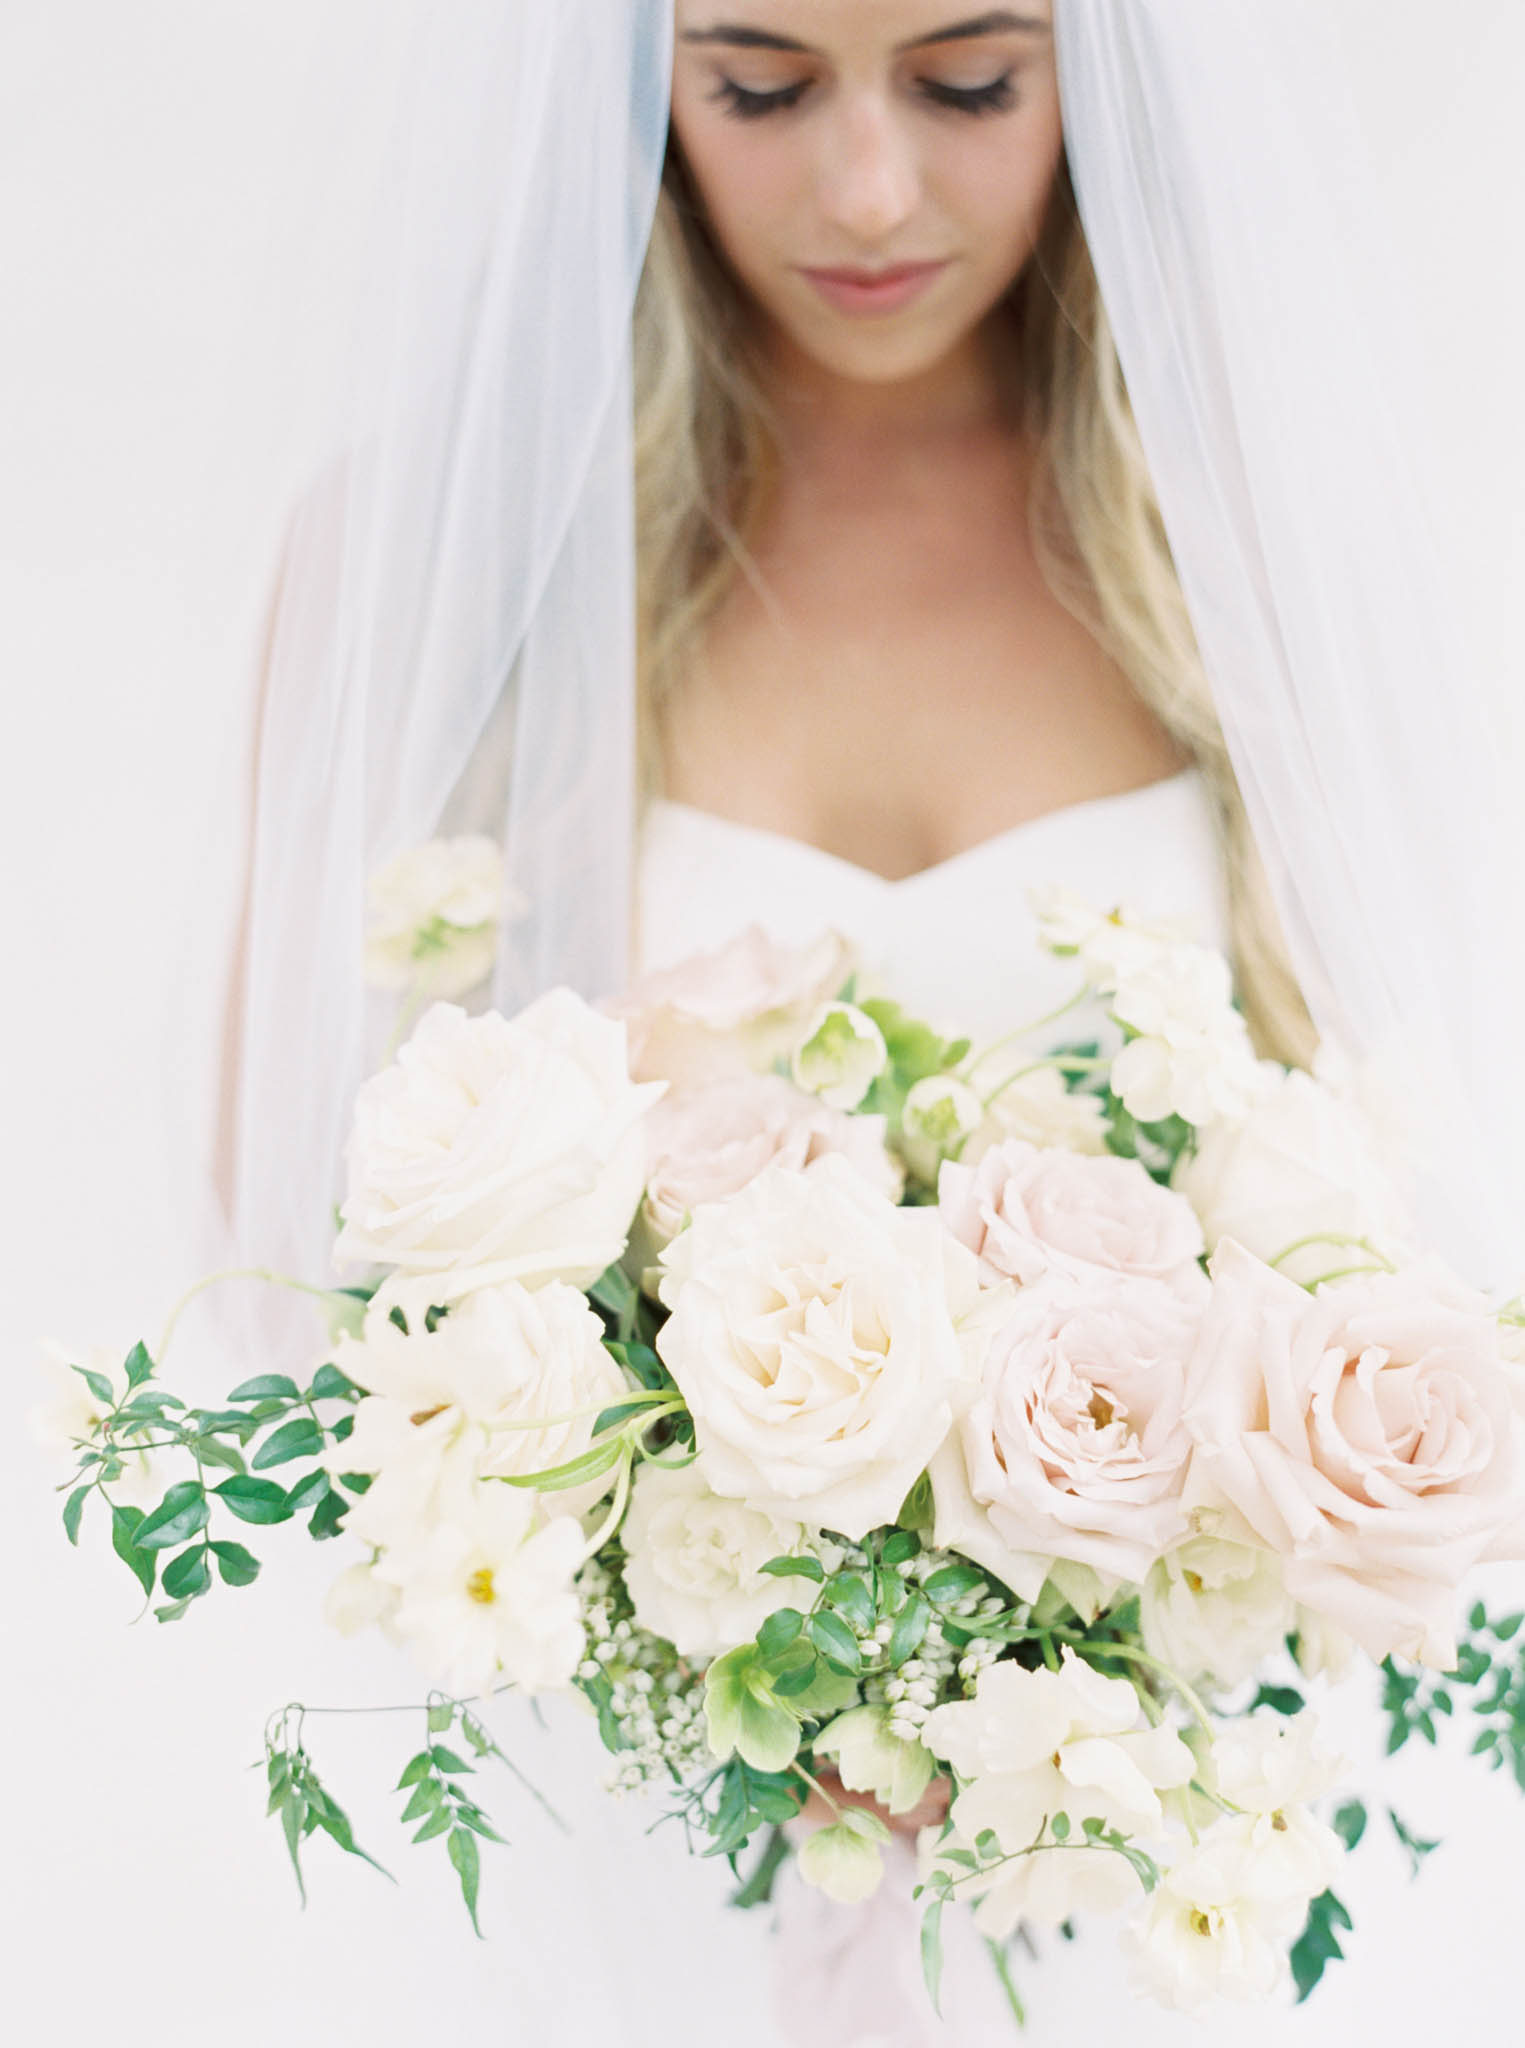 Alys Beach wedding photography fine art